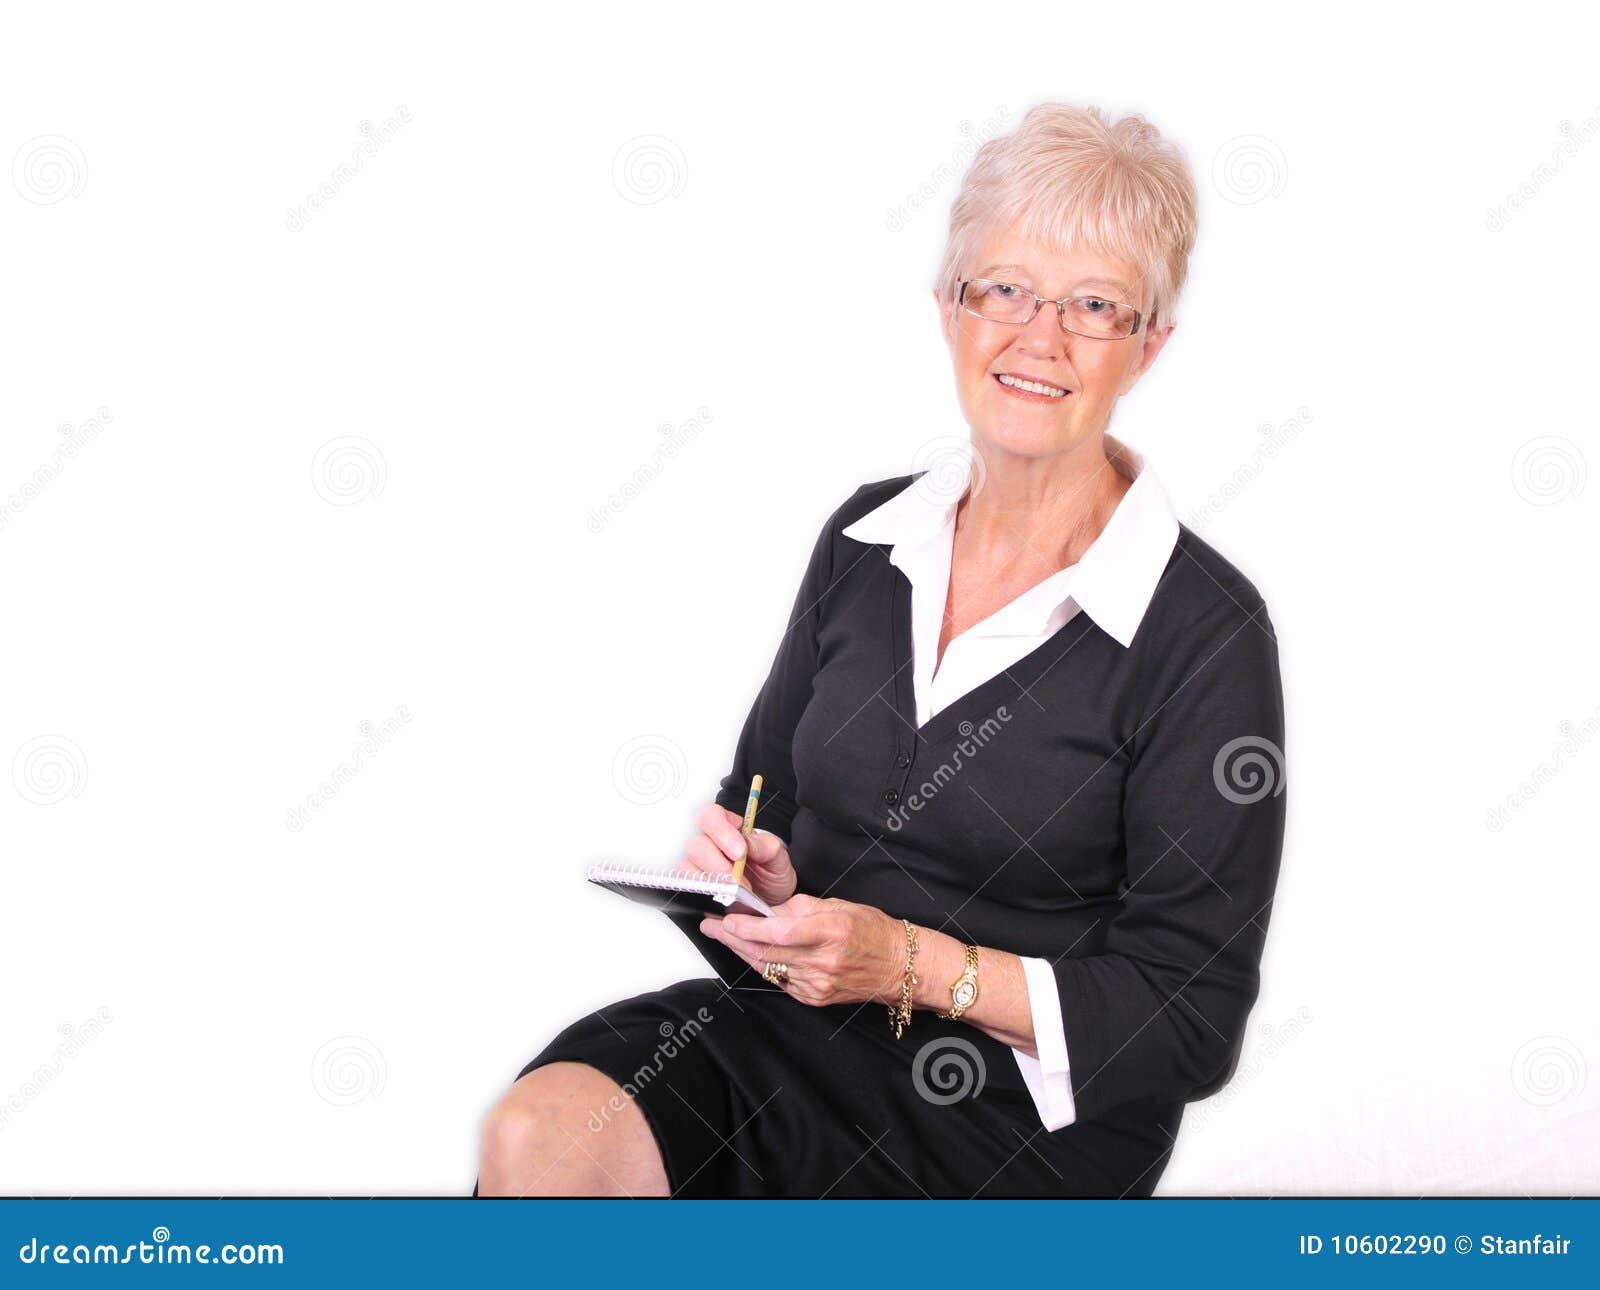 mature secretary taking notes stock photo - image of businesswoman